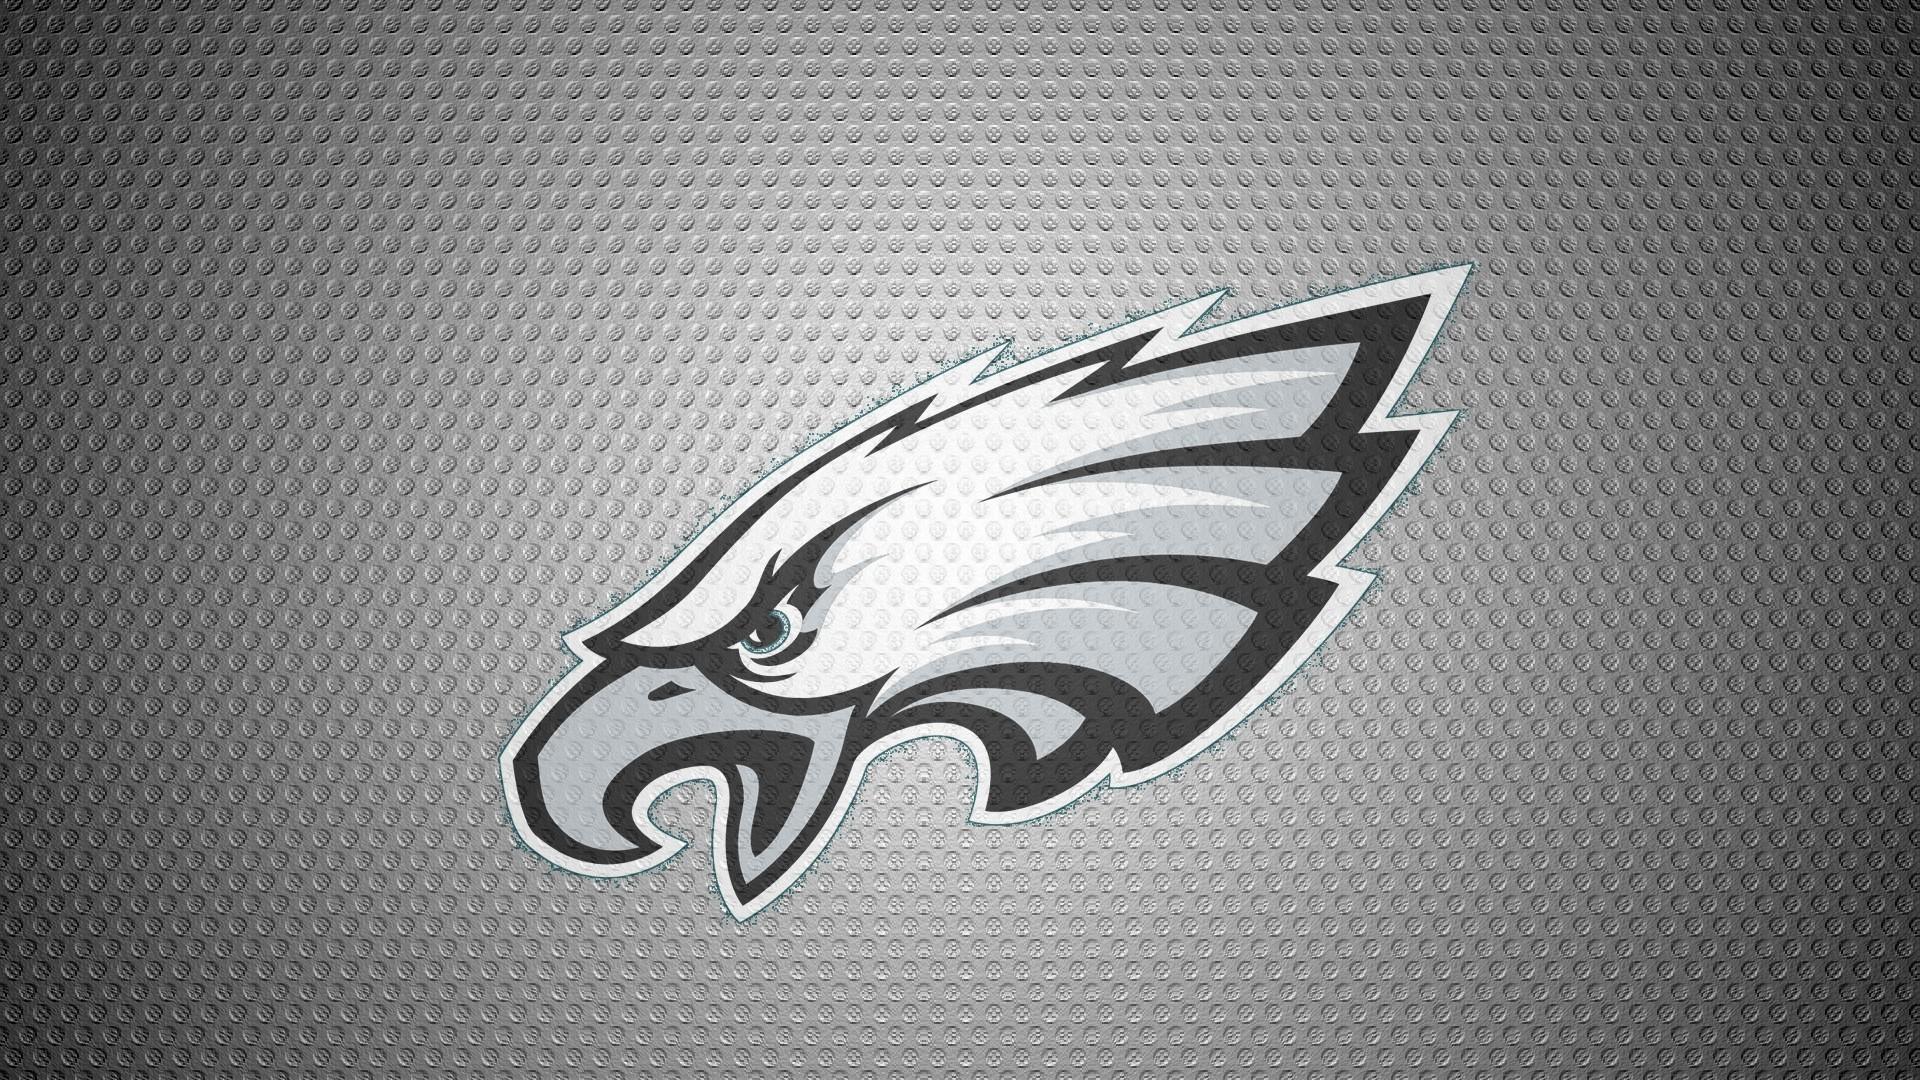 Eagles wallpaper ·① Download free amazing backgrounds for desktop ...